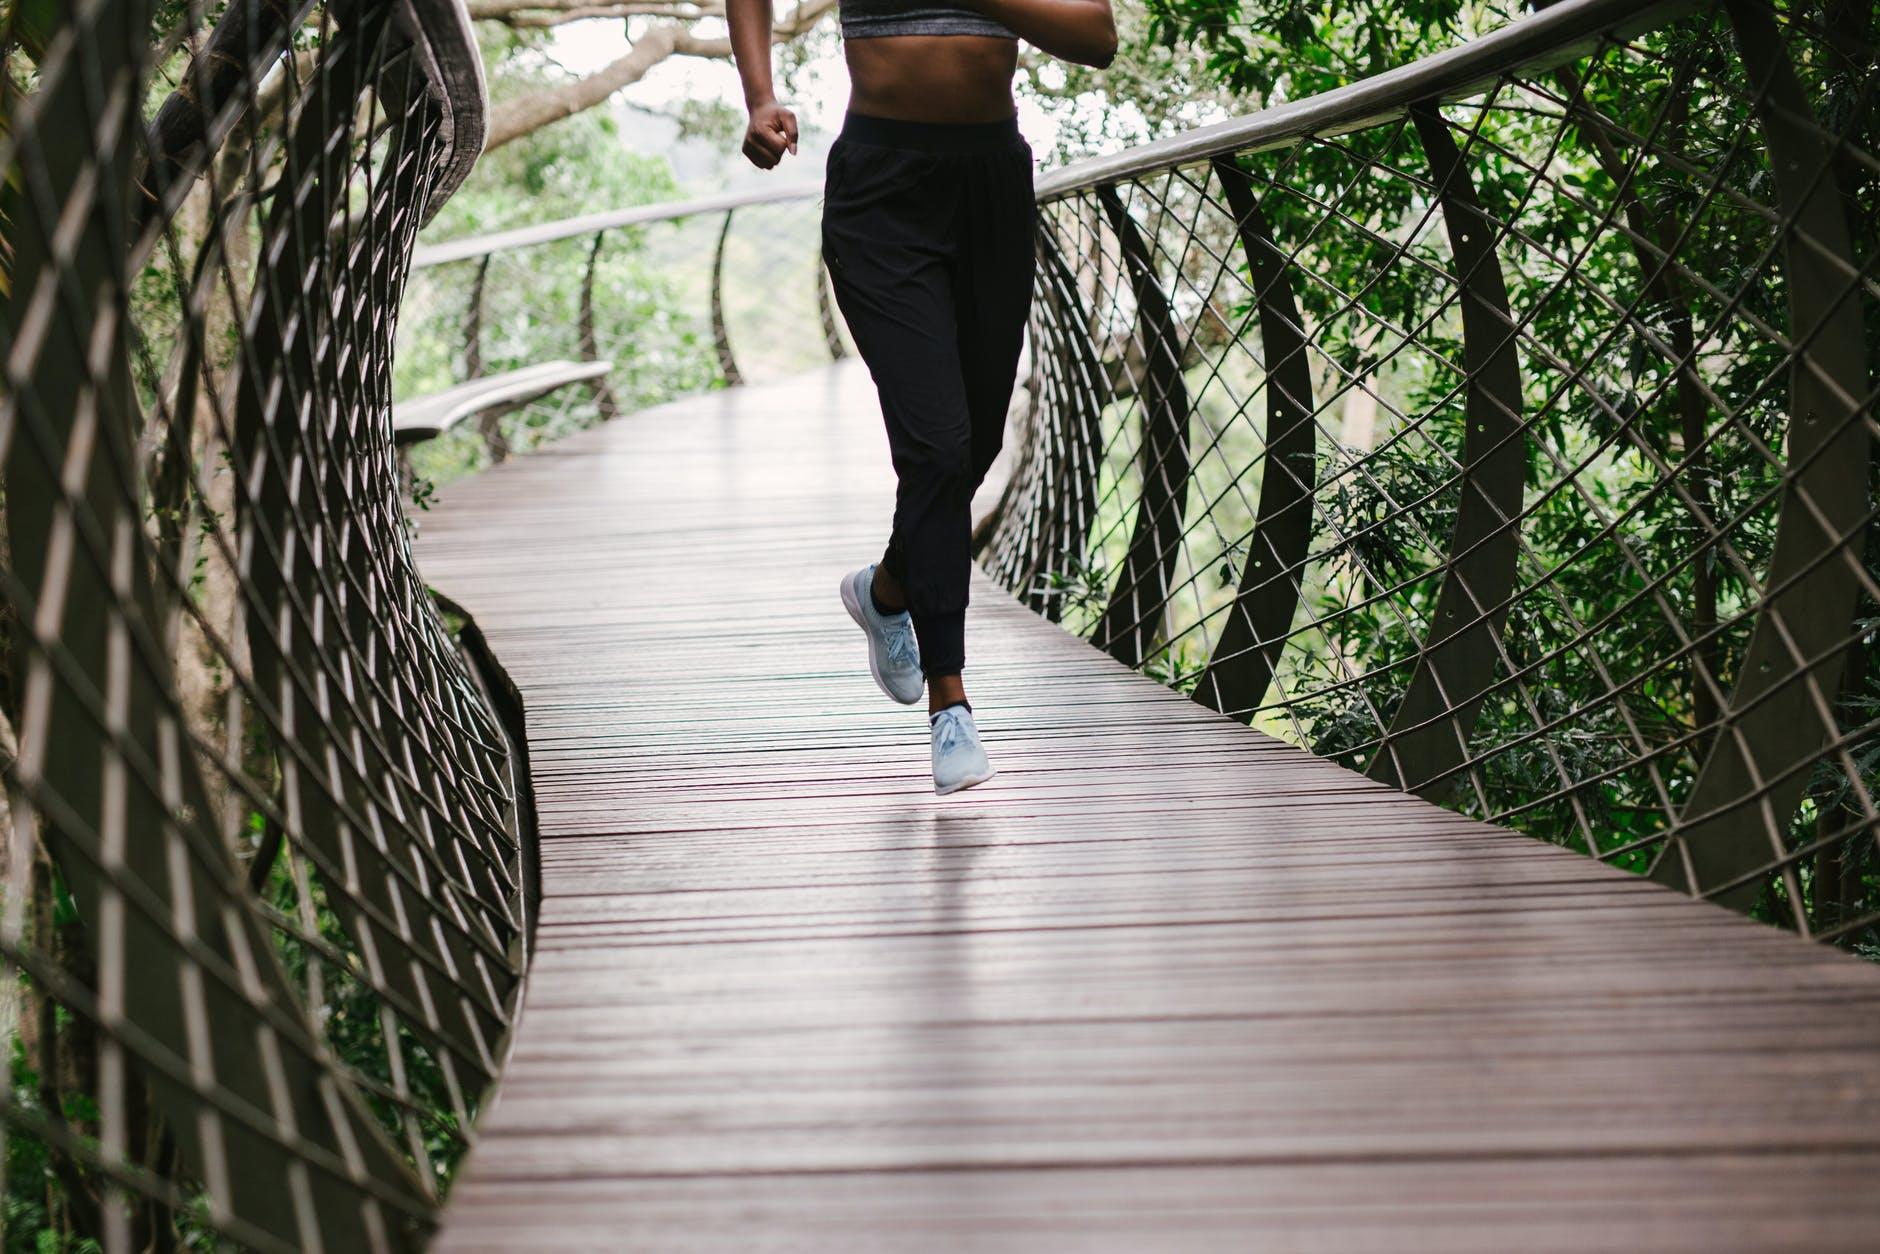 photo of person running on bridge